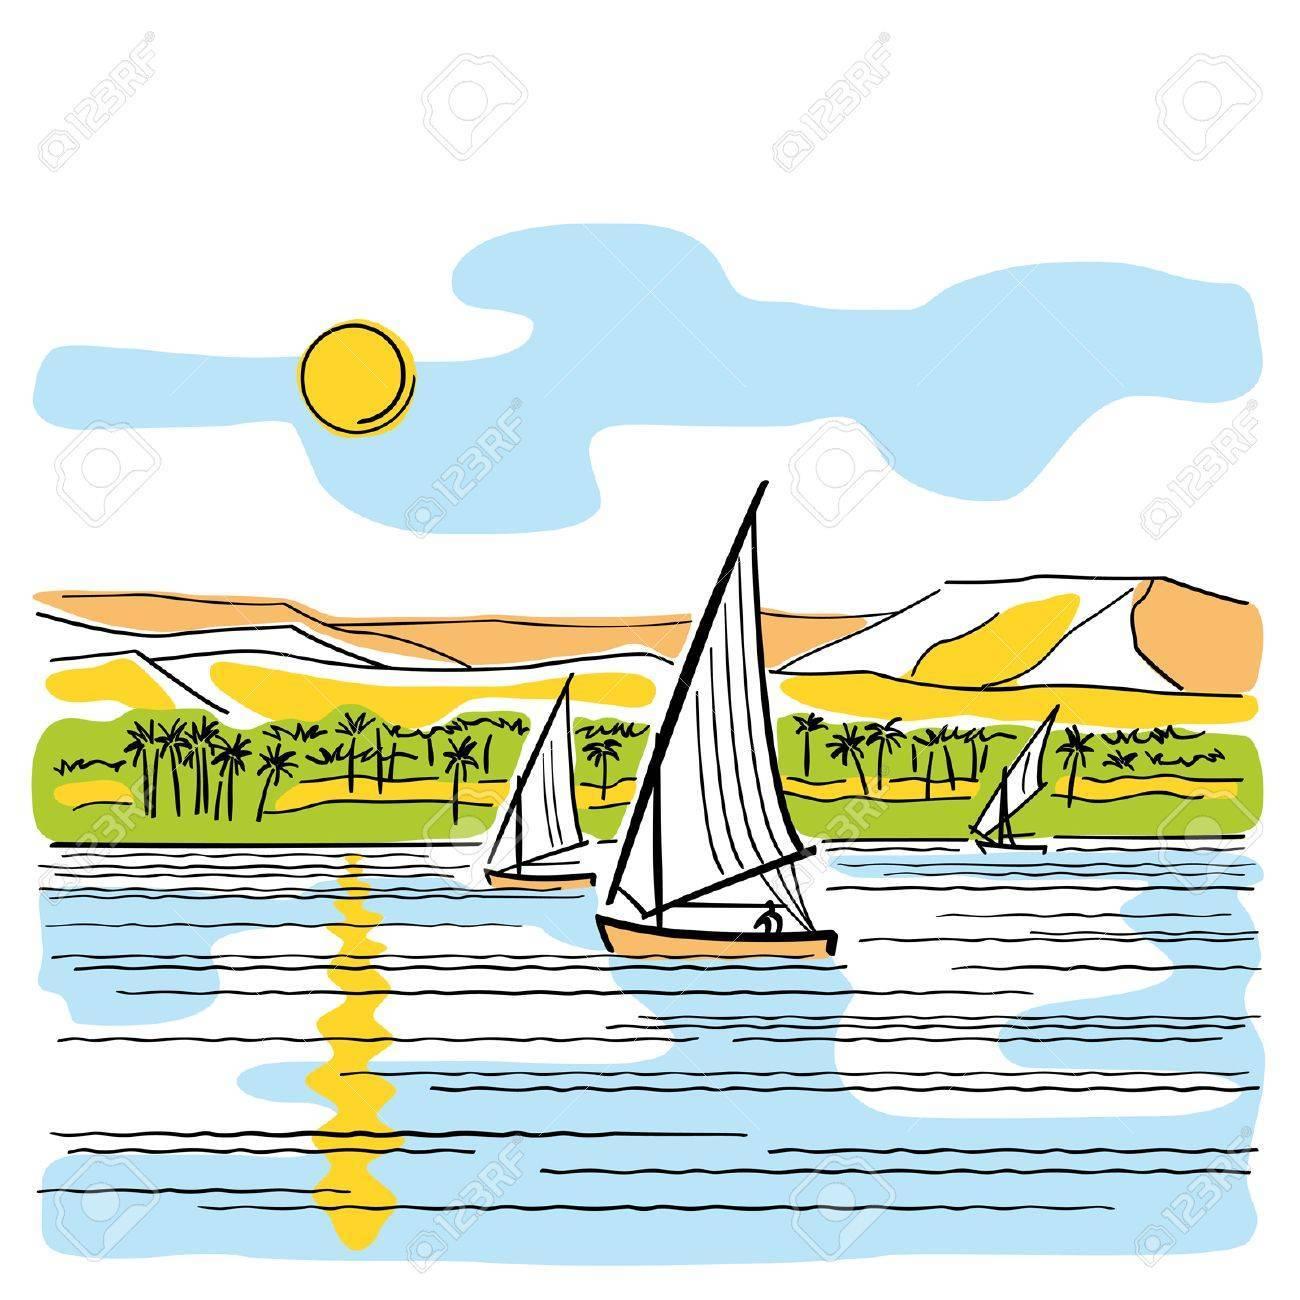 River nile clipart 5 » Clipart Portal.